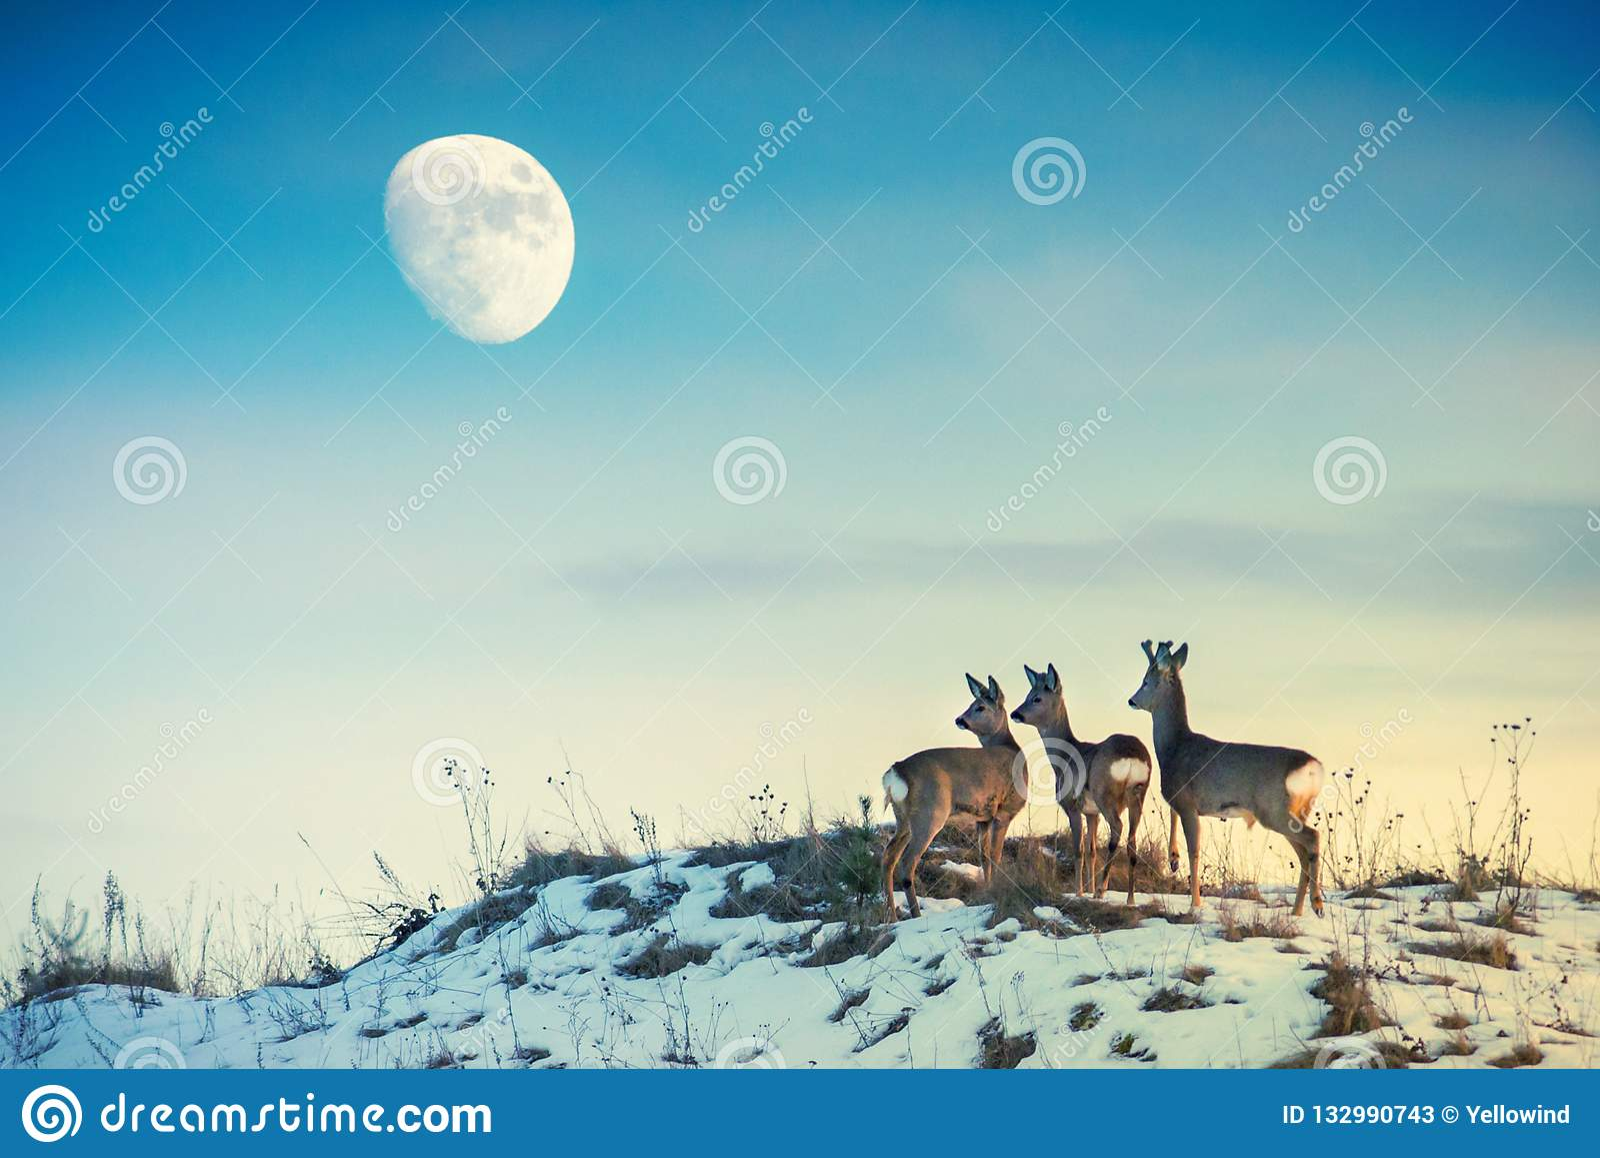 Rådjur på en kulle som ser till månen